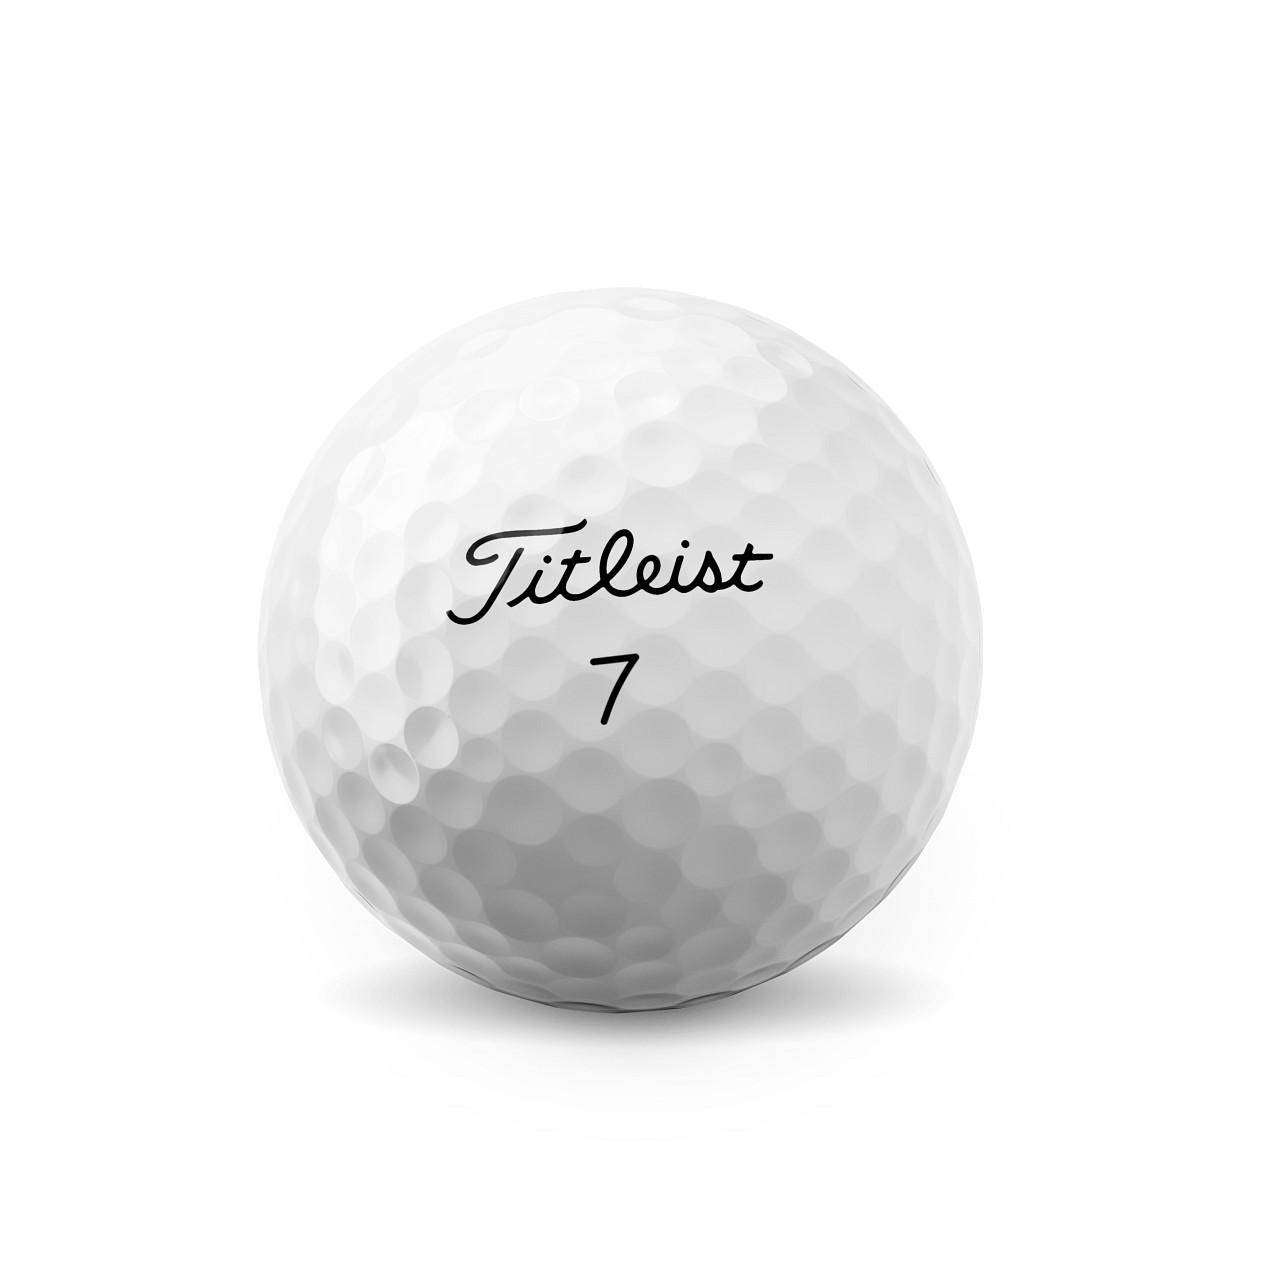 Titleist Pro V1 Dozen Golf Balls 2021 - High Numbers (#5 - #8)